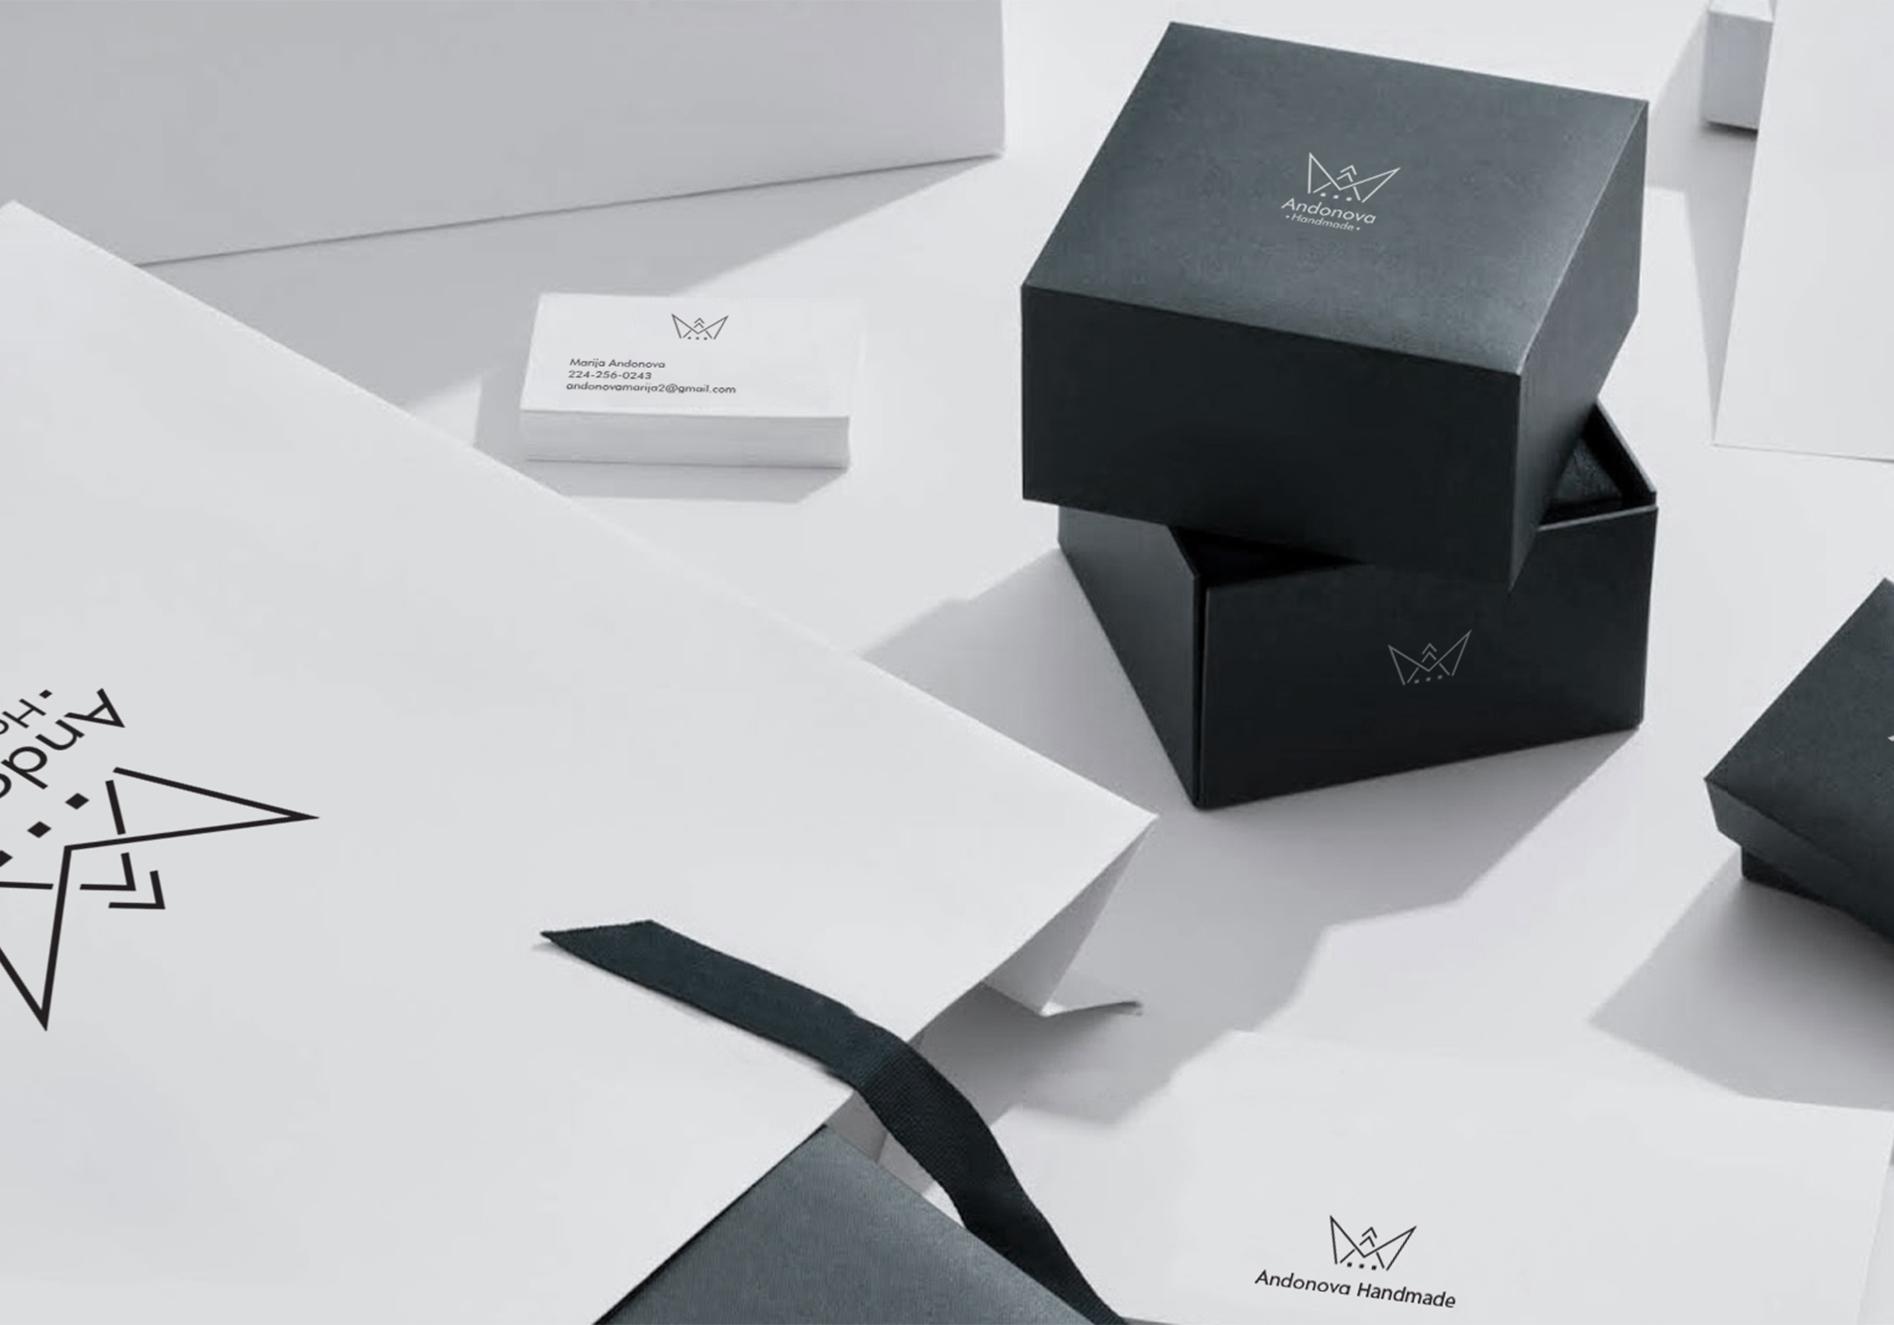 Andonova packaging design